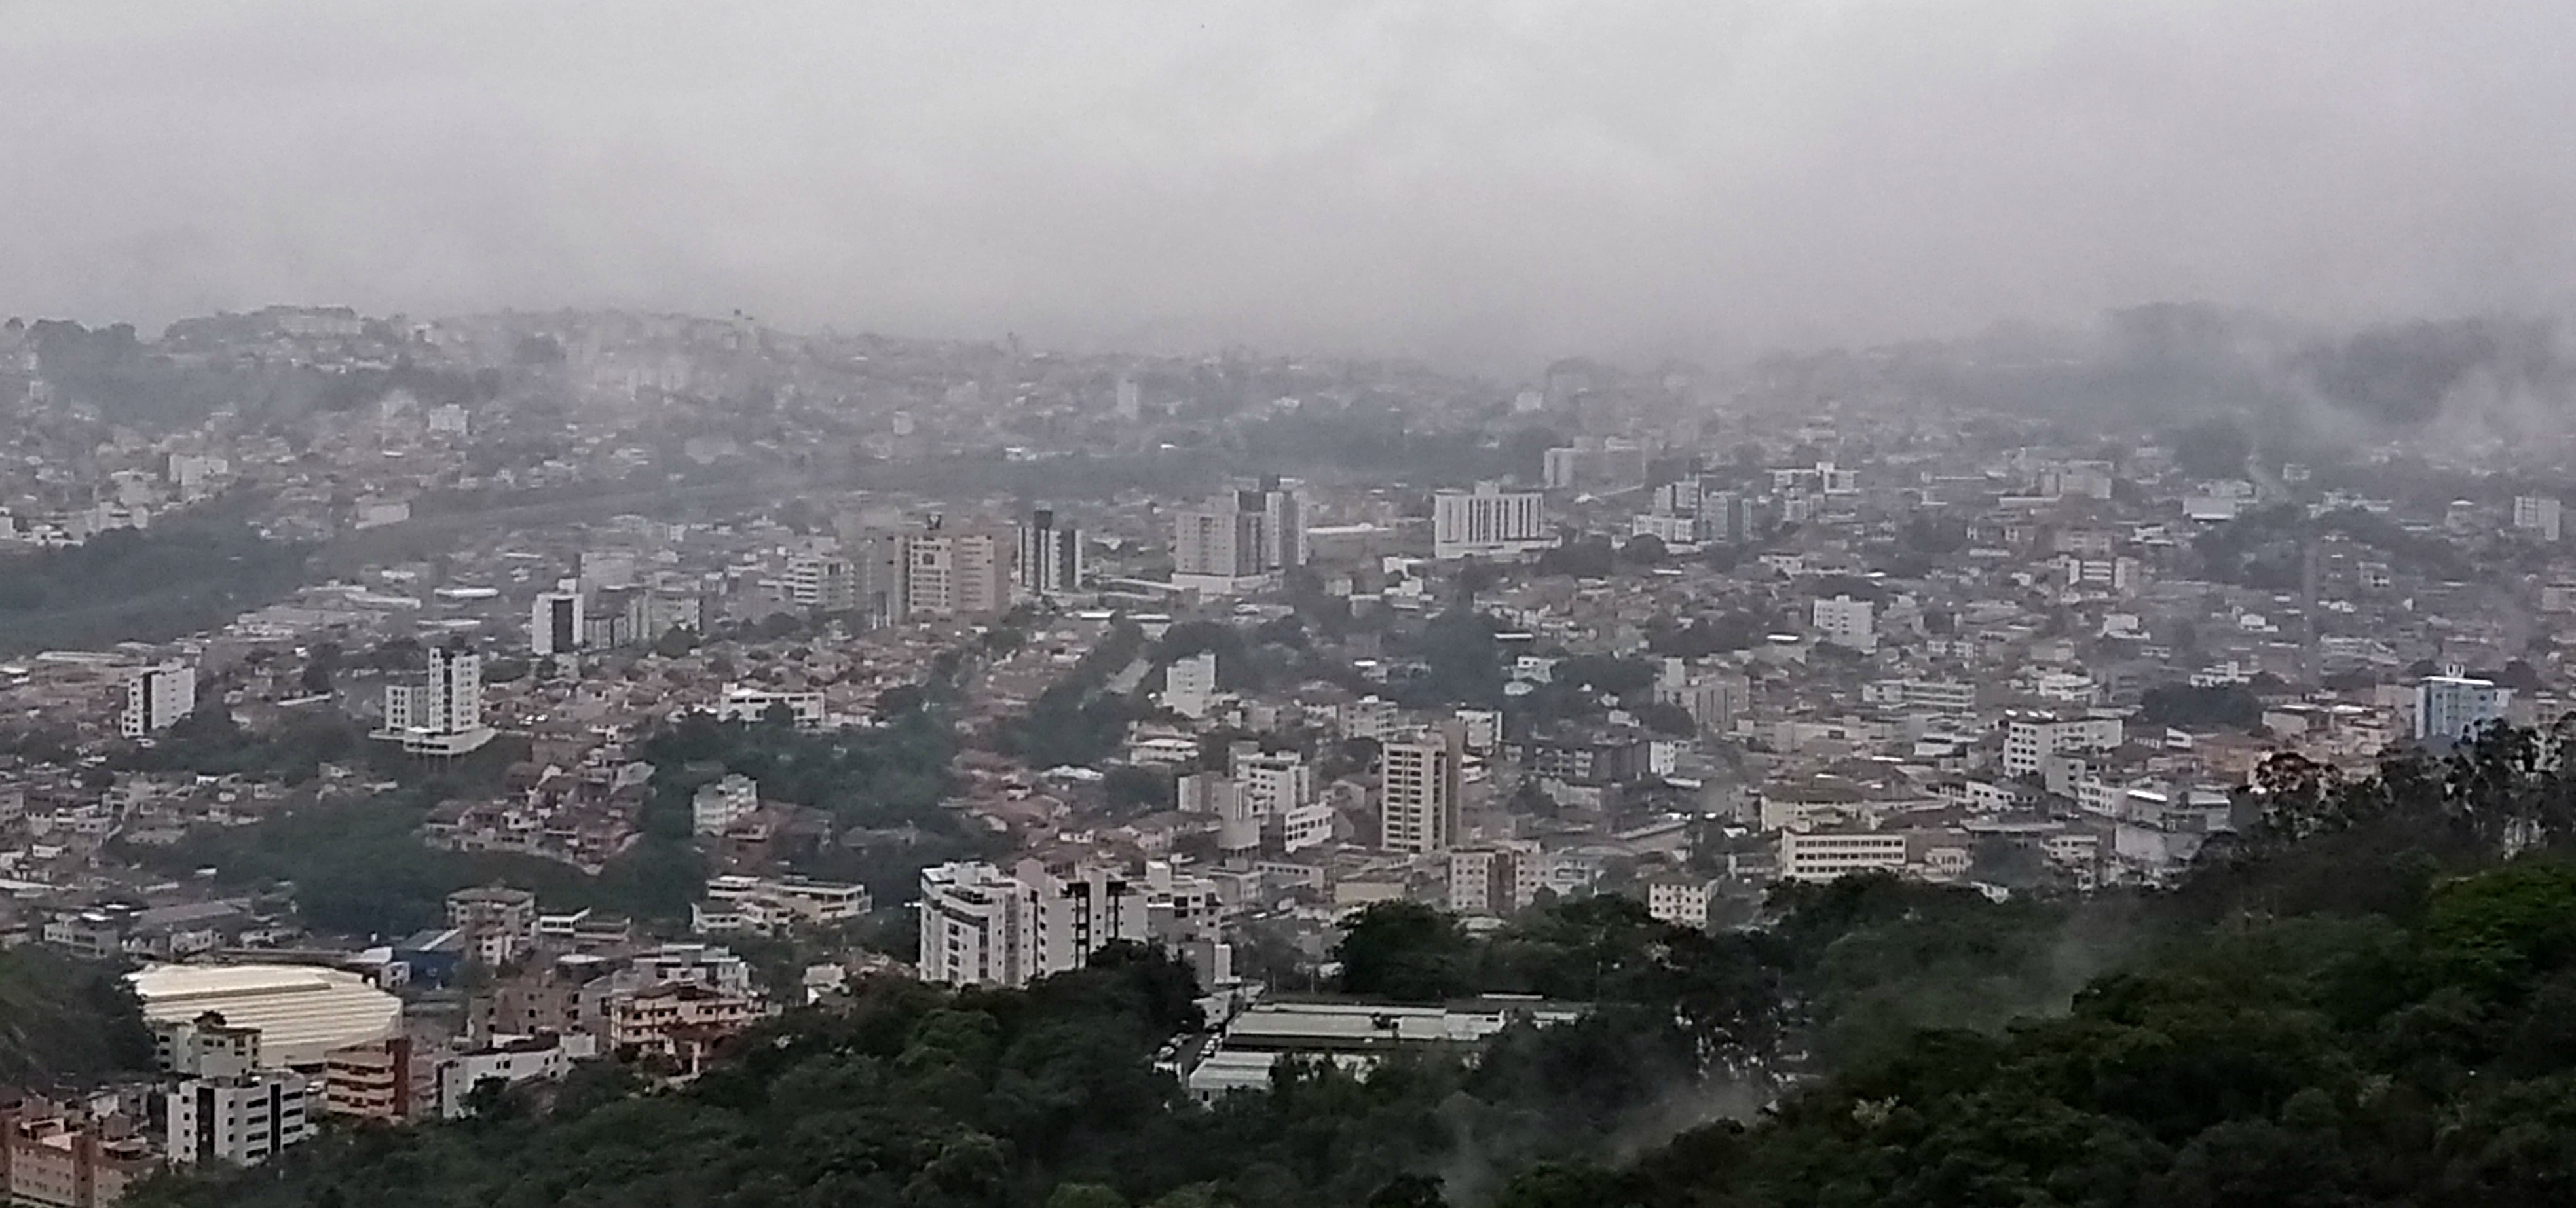 Itabira terá pancadas de chuva até terça-feira, prevê Inmet